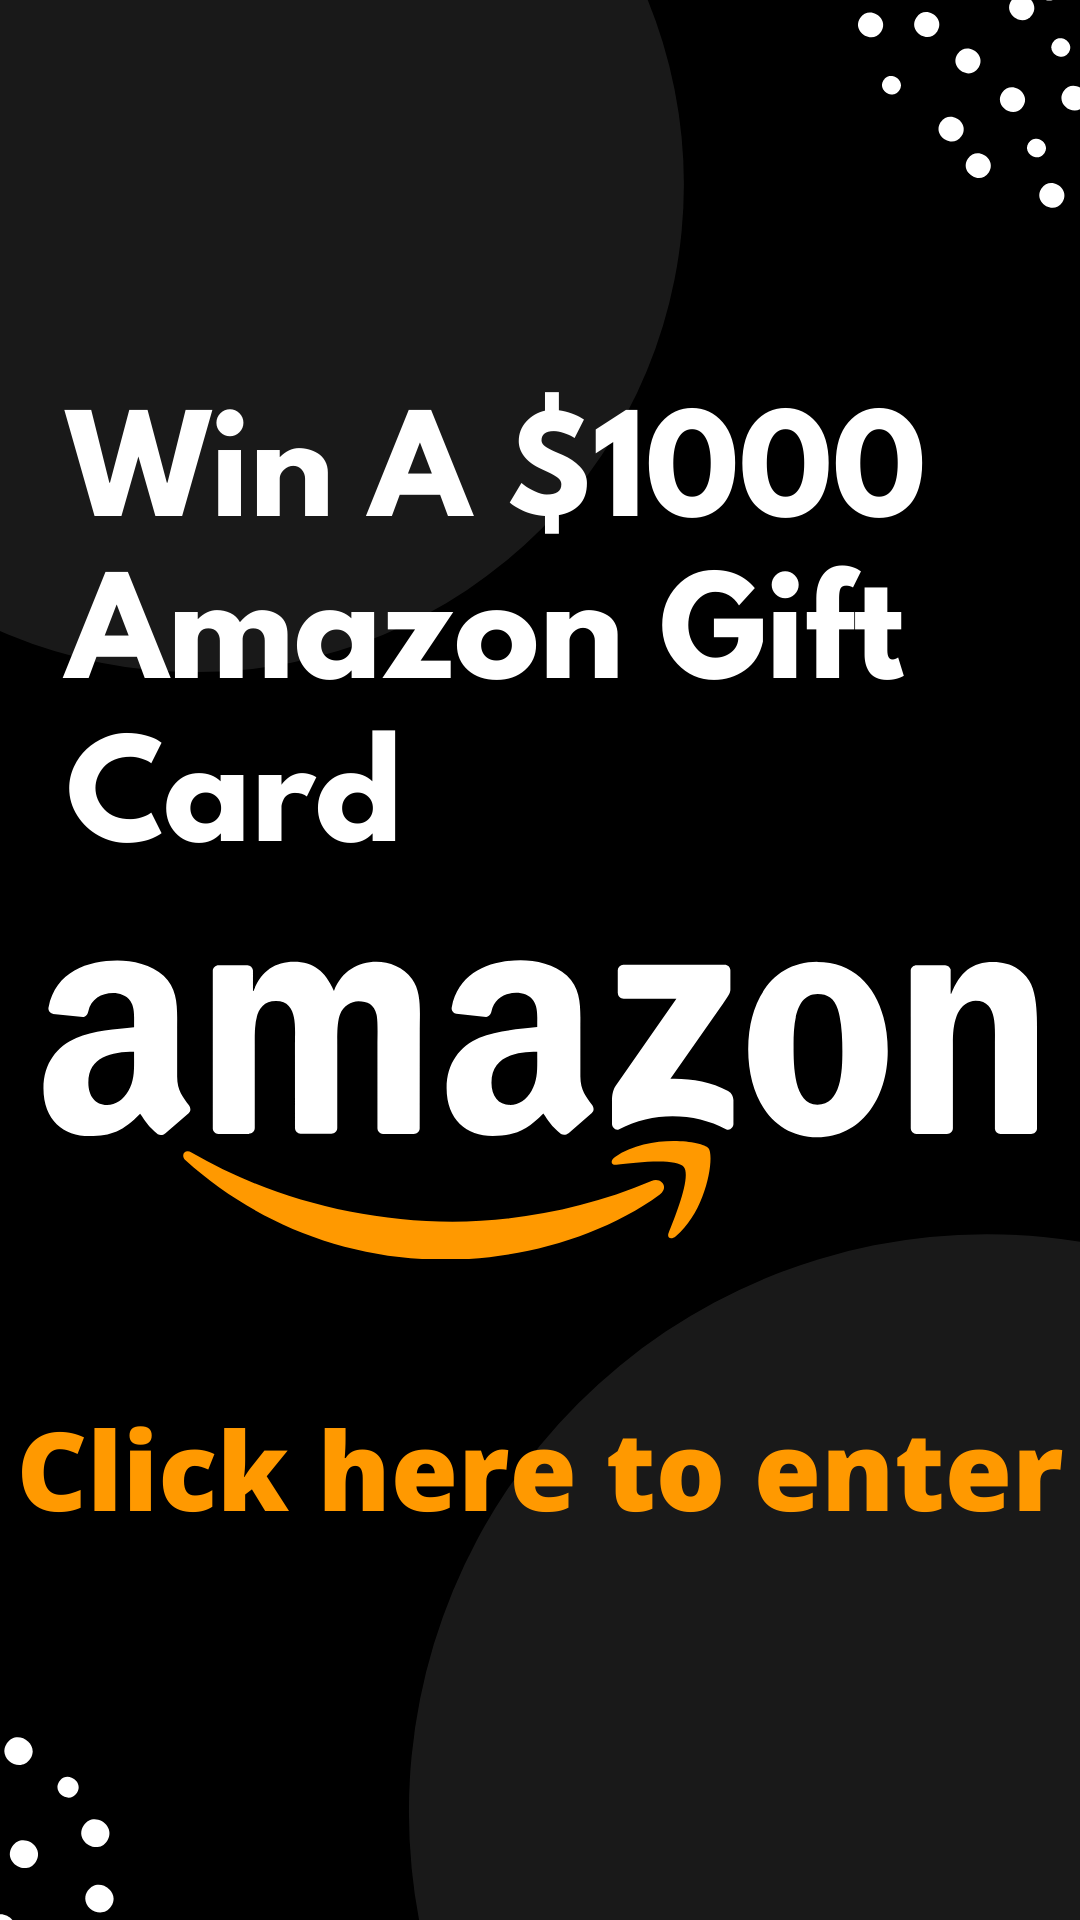 Win A 1000 Amazon Gift Card Gift Card Amazon Gift Cards Affiliate Marketing Course